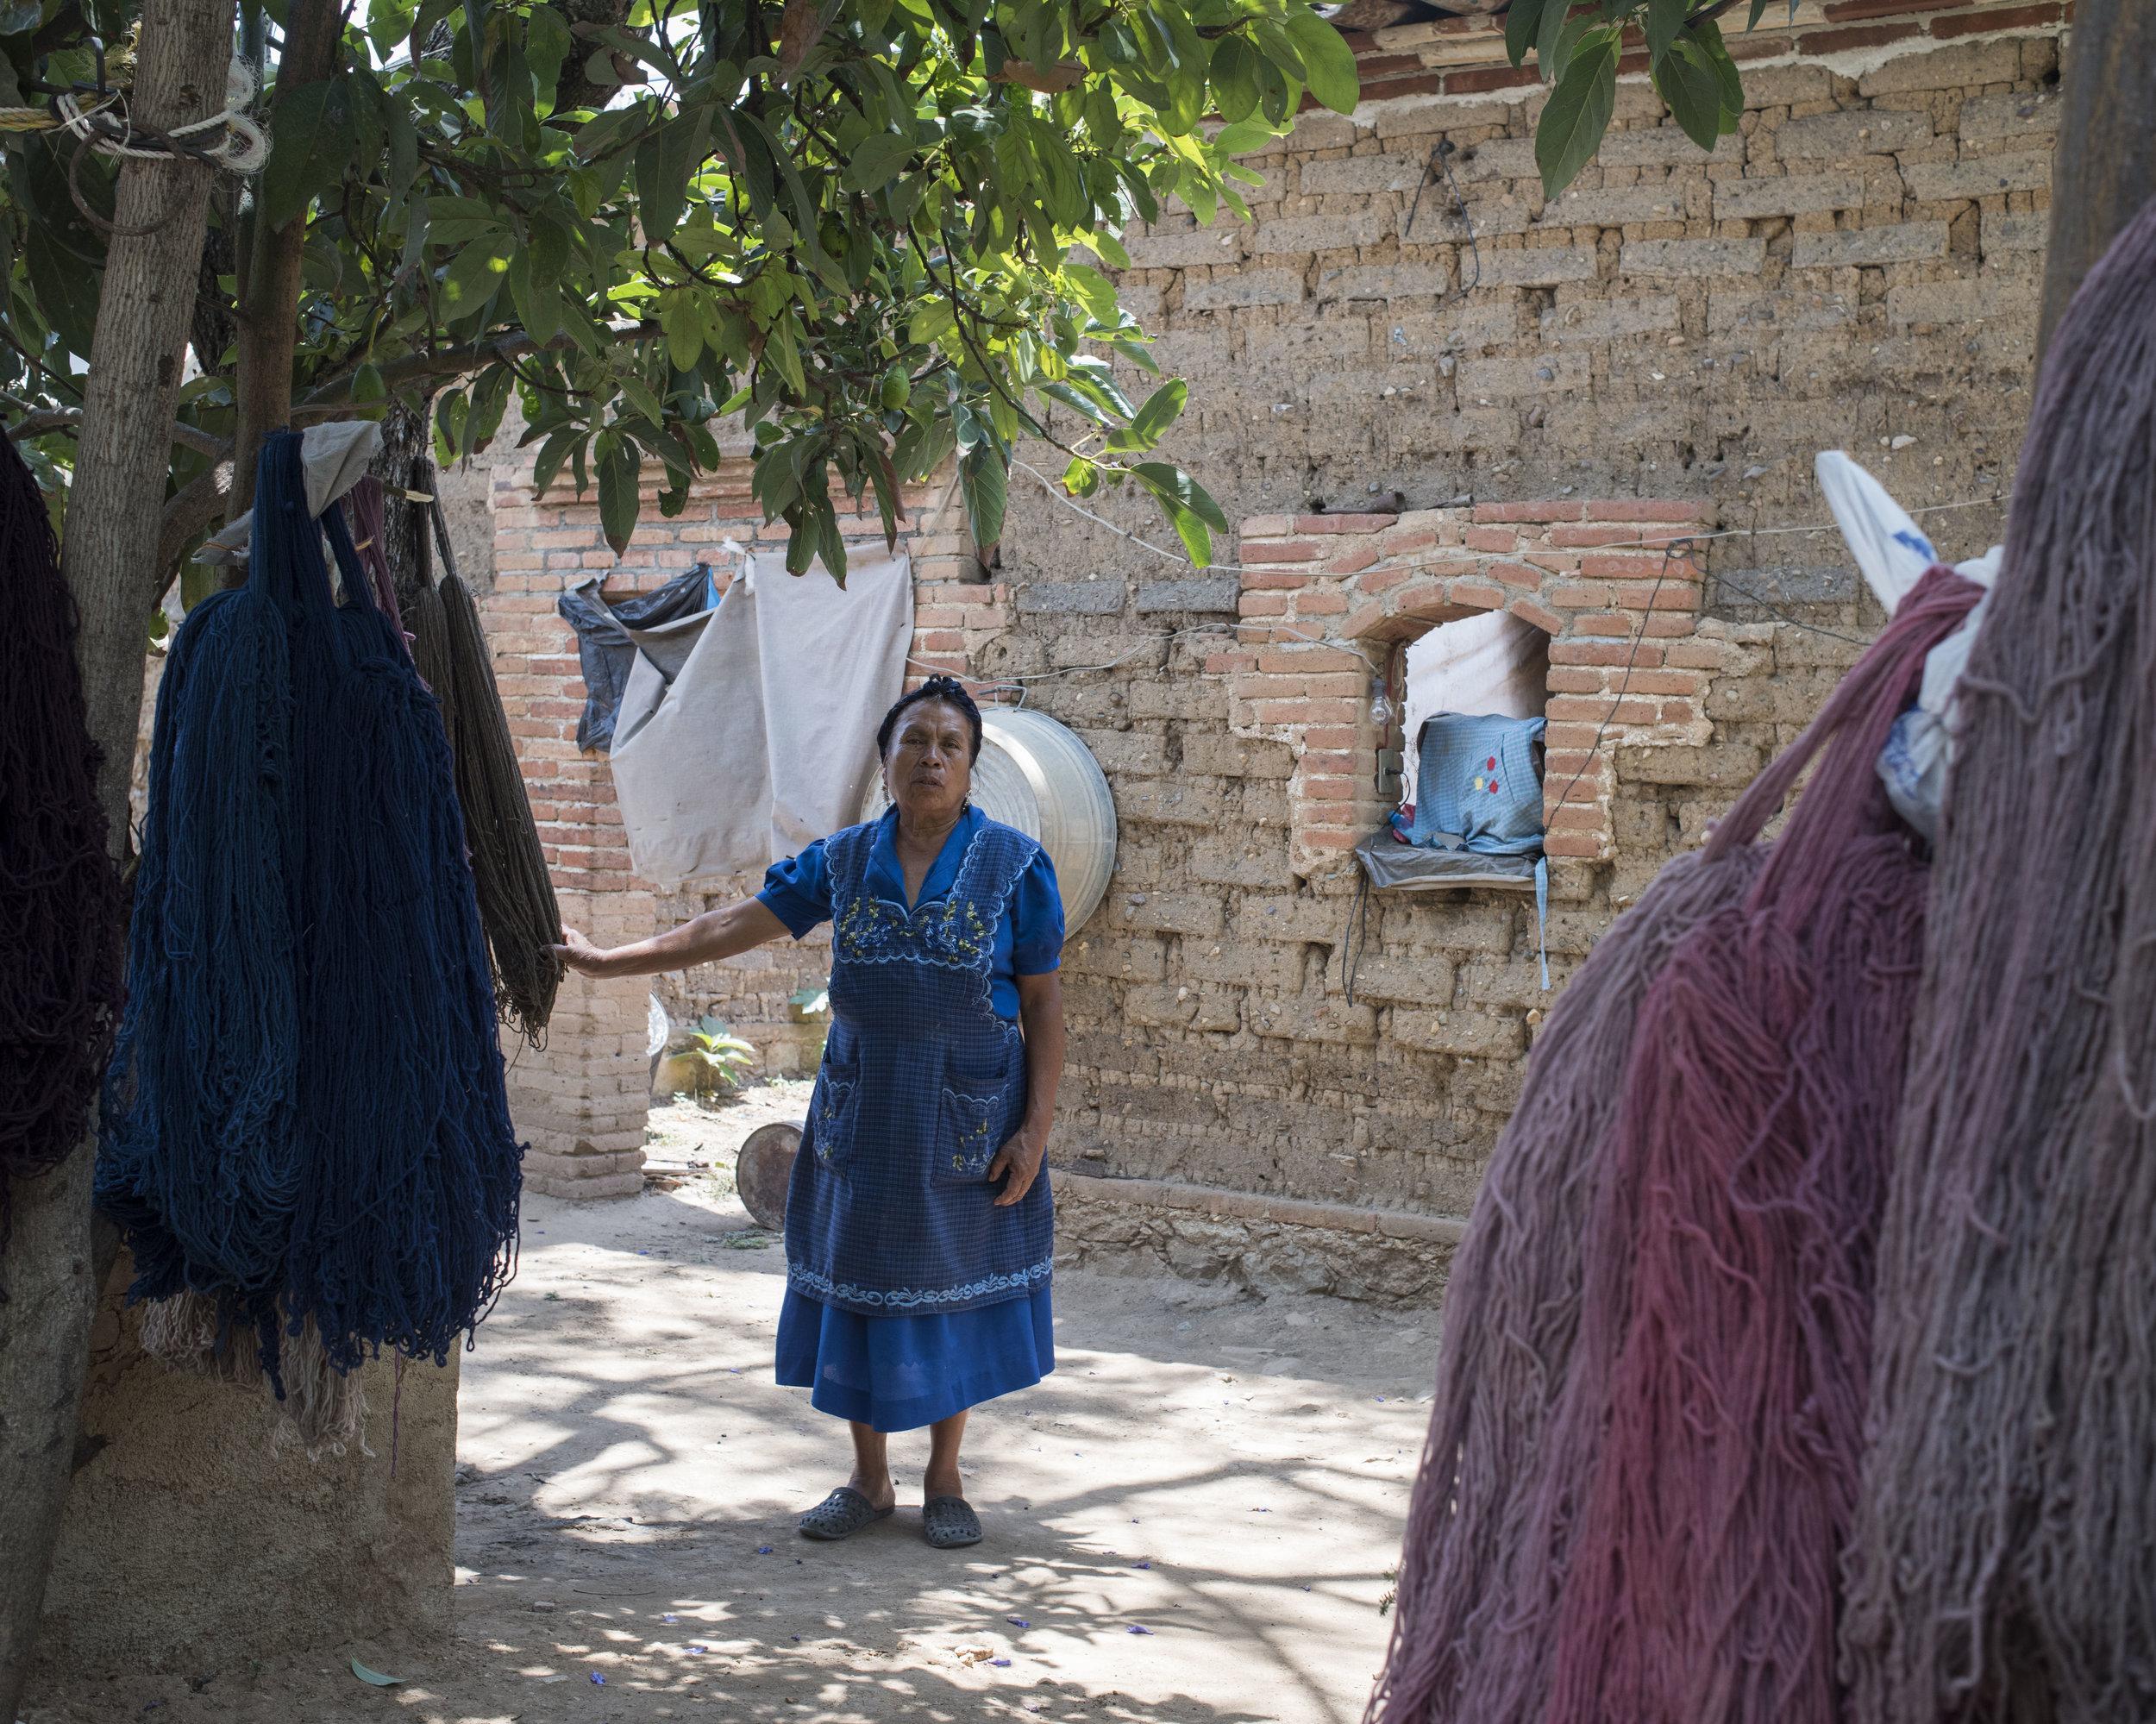 Margarita Chávez, Teotitlan, OAX.